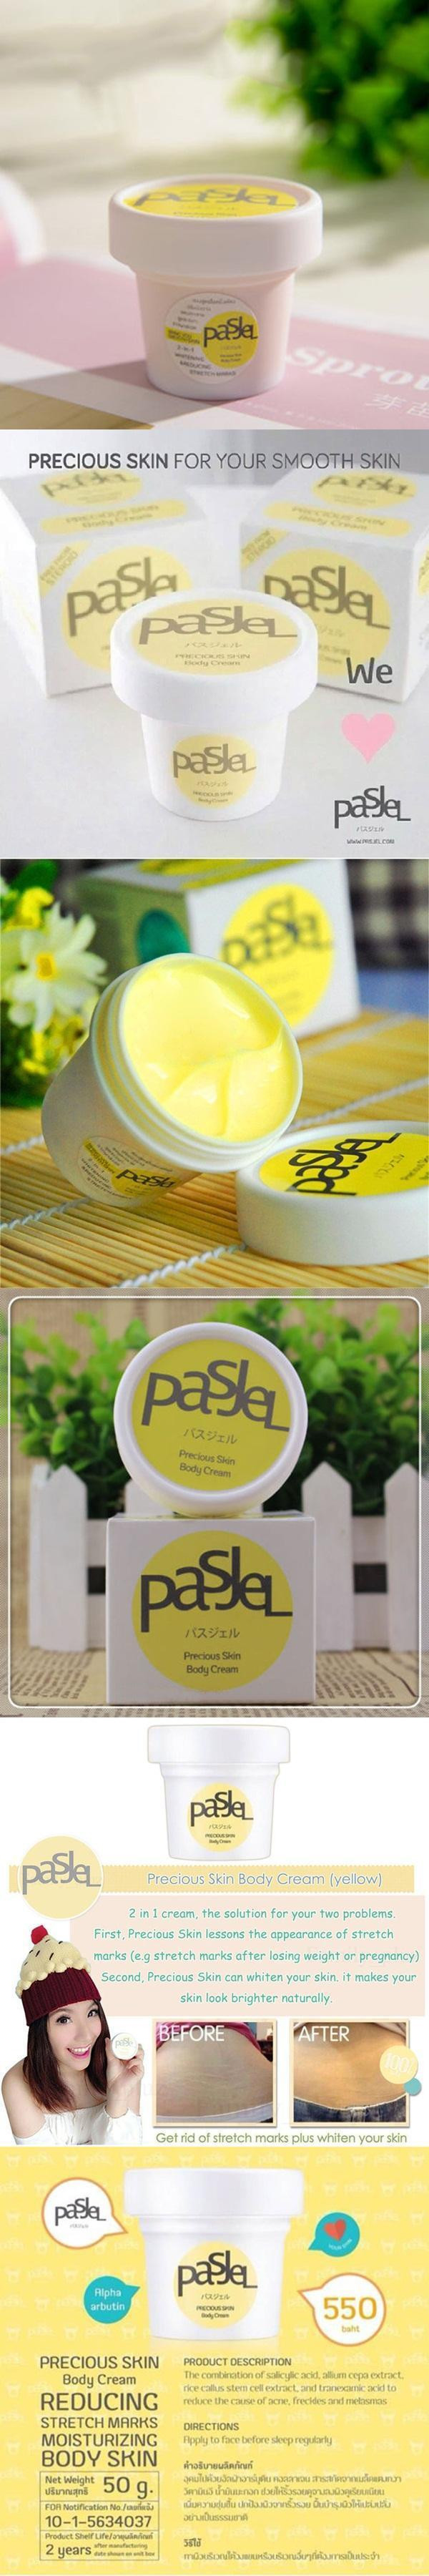 Pasjel Skin Stretch Marks Removal Cream